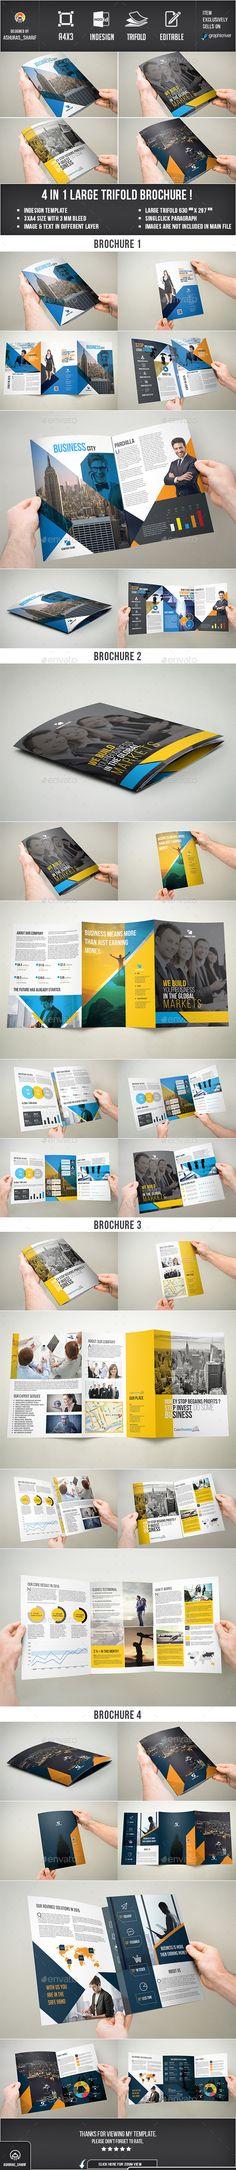 Brochure - Corporate Brochure Template InDesign INDD. Download here: http://graphicriver.net/item/brochure/12779253?s_rank=1797&ref=yinkira